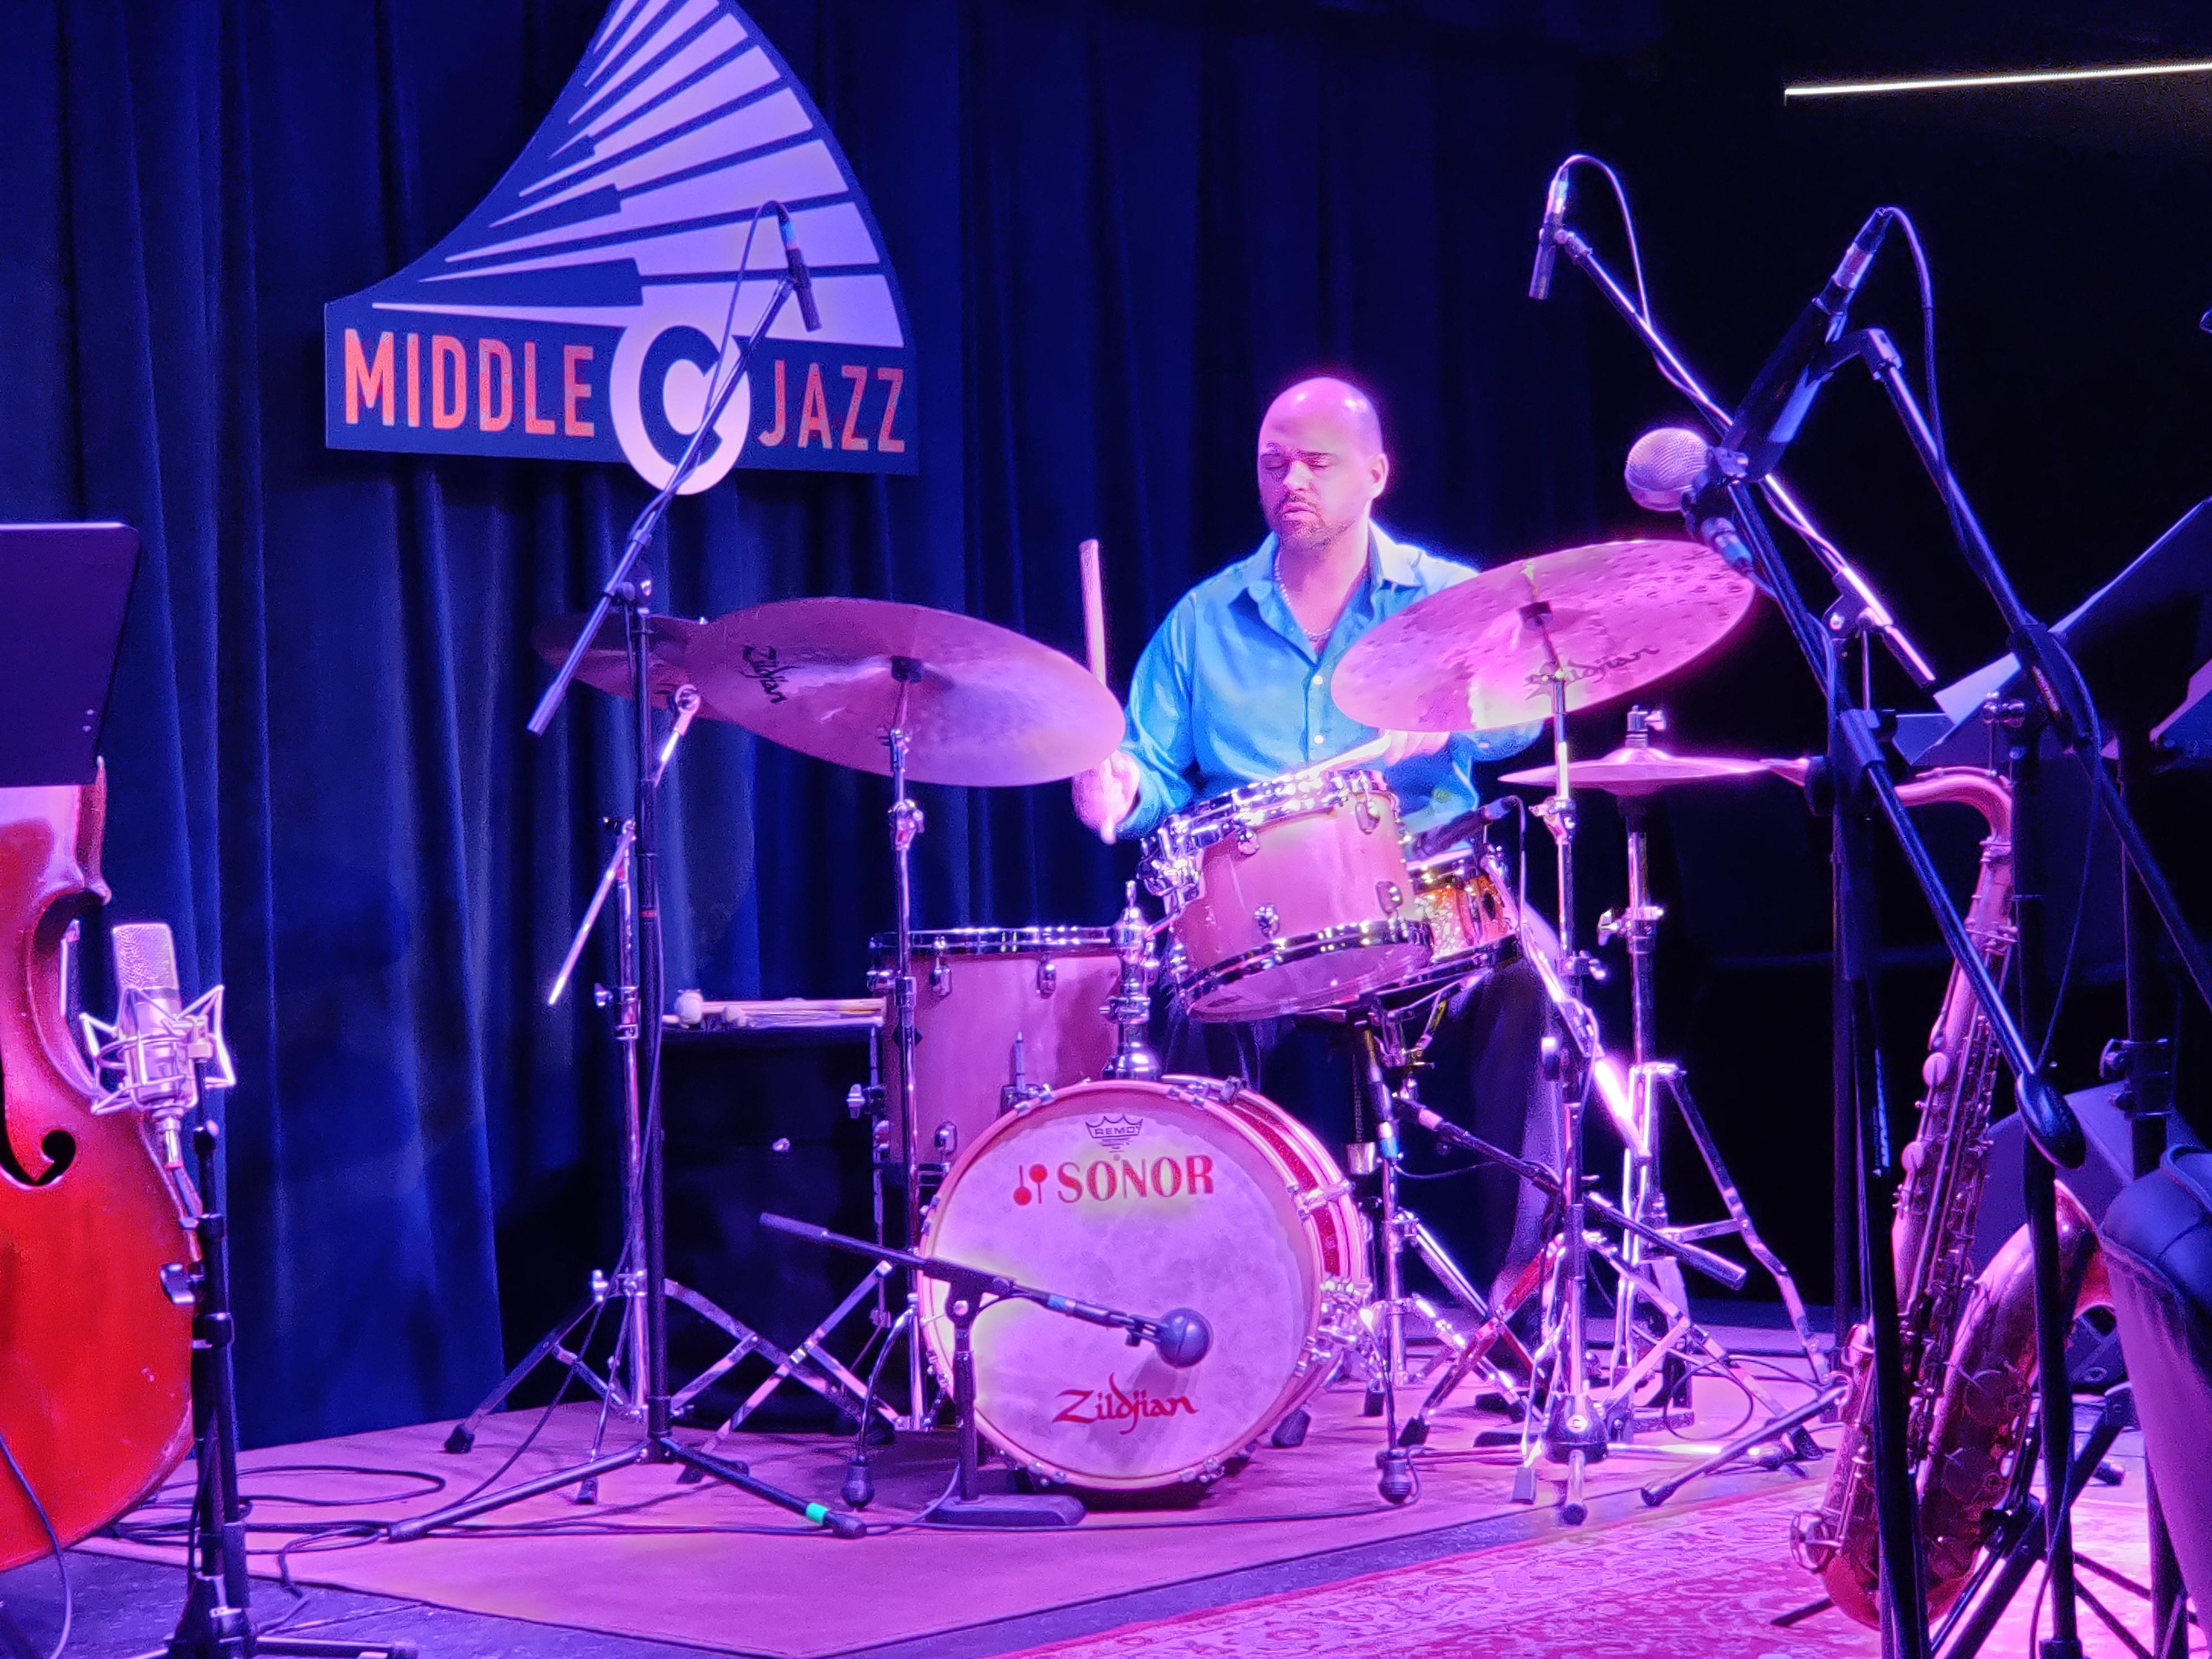 Joe Barna at Middle C Jazz